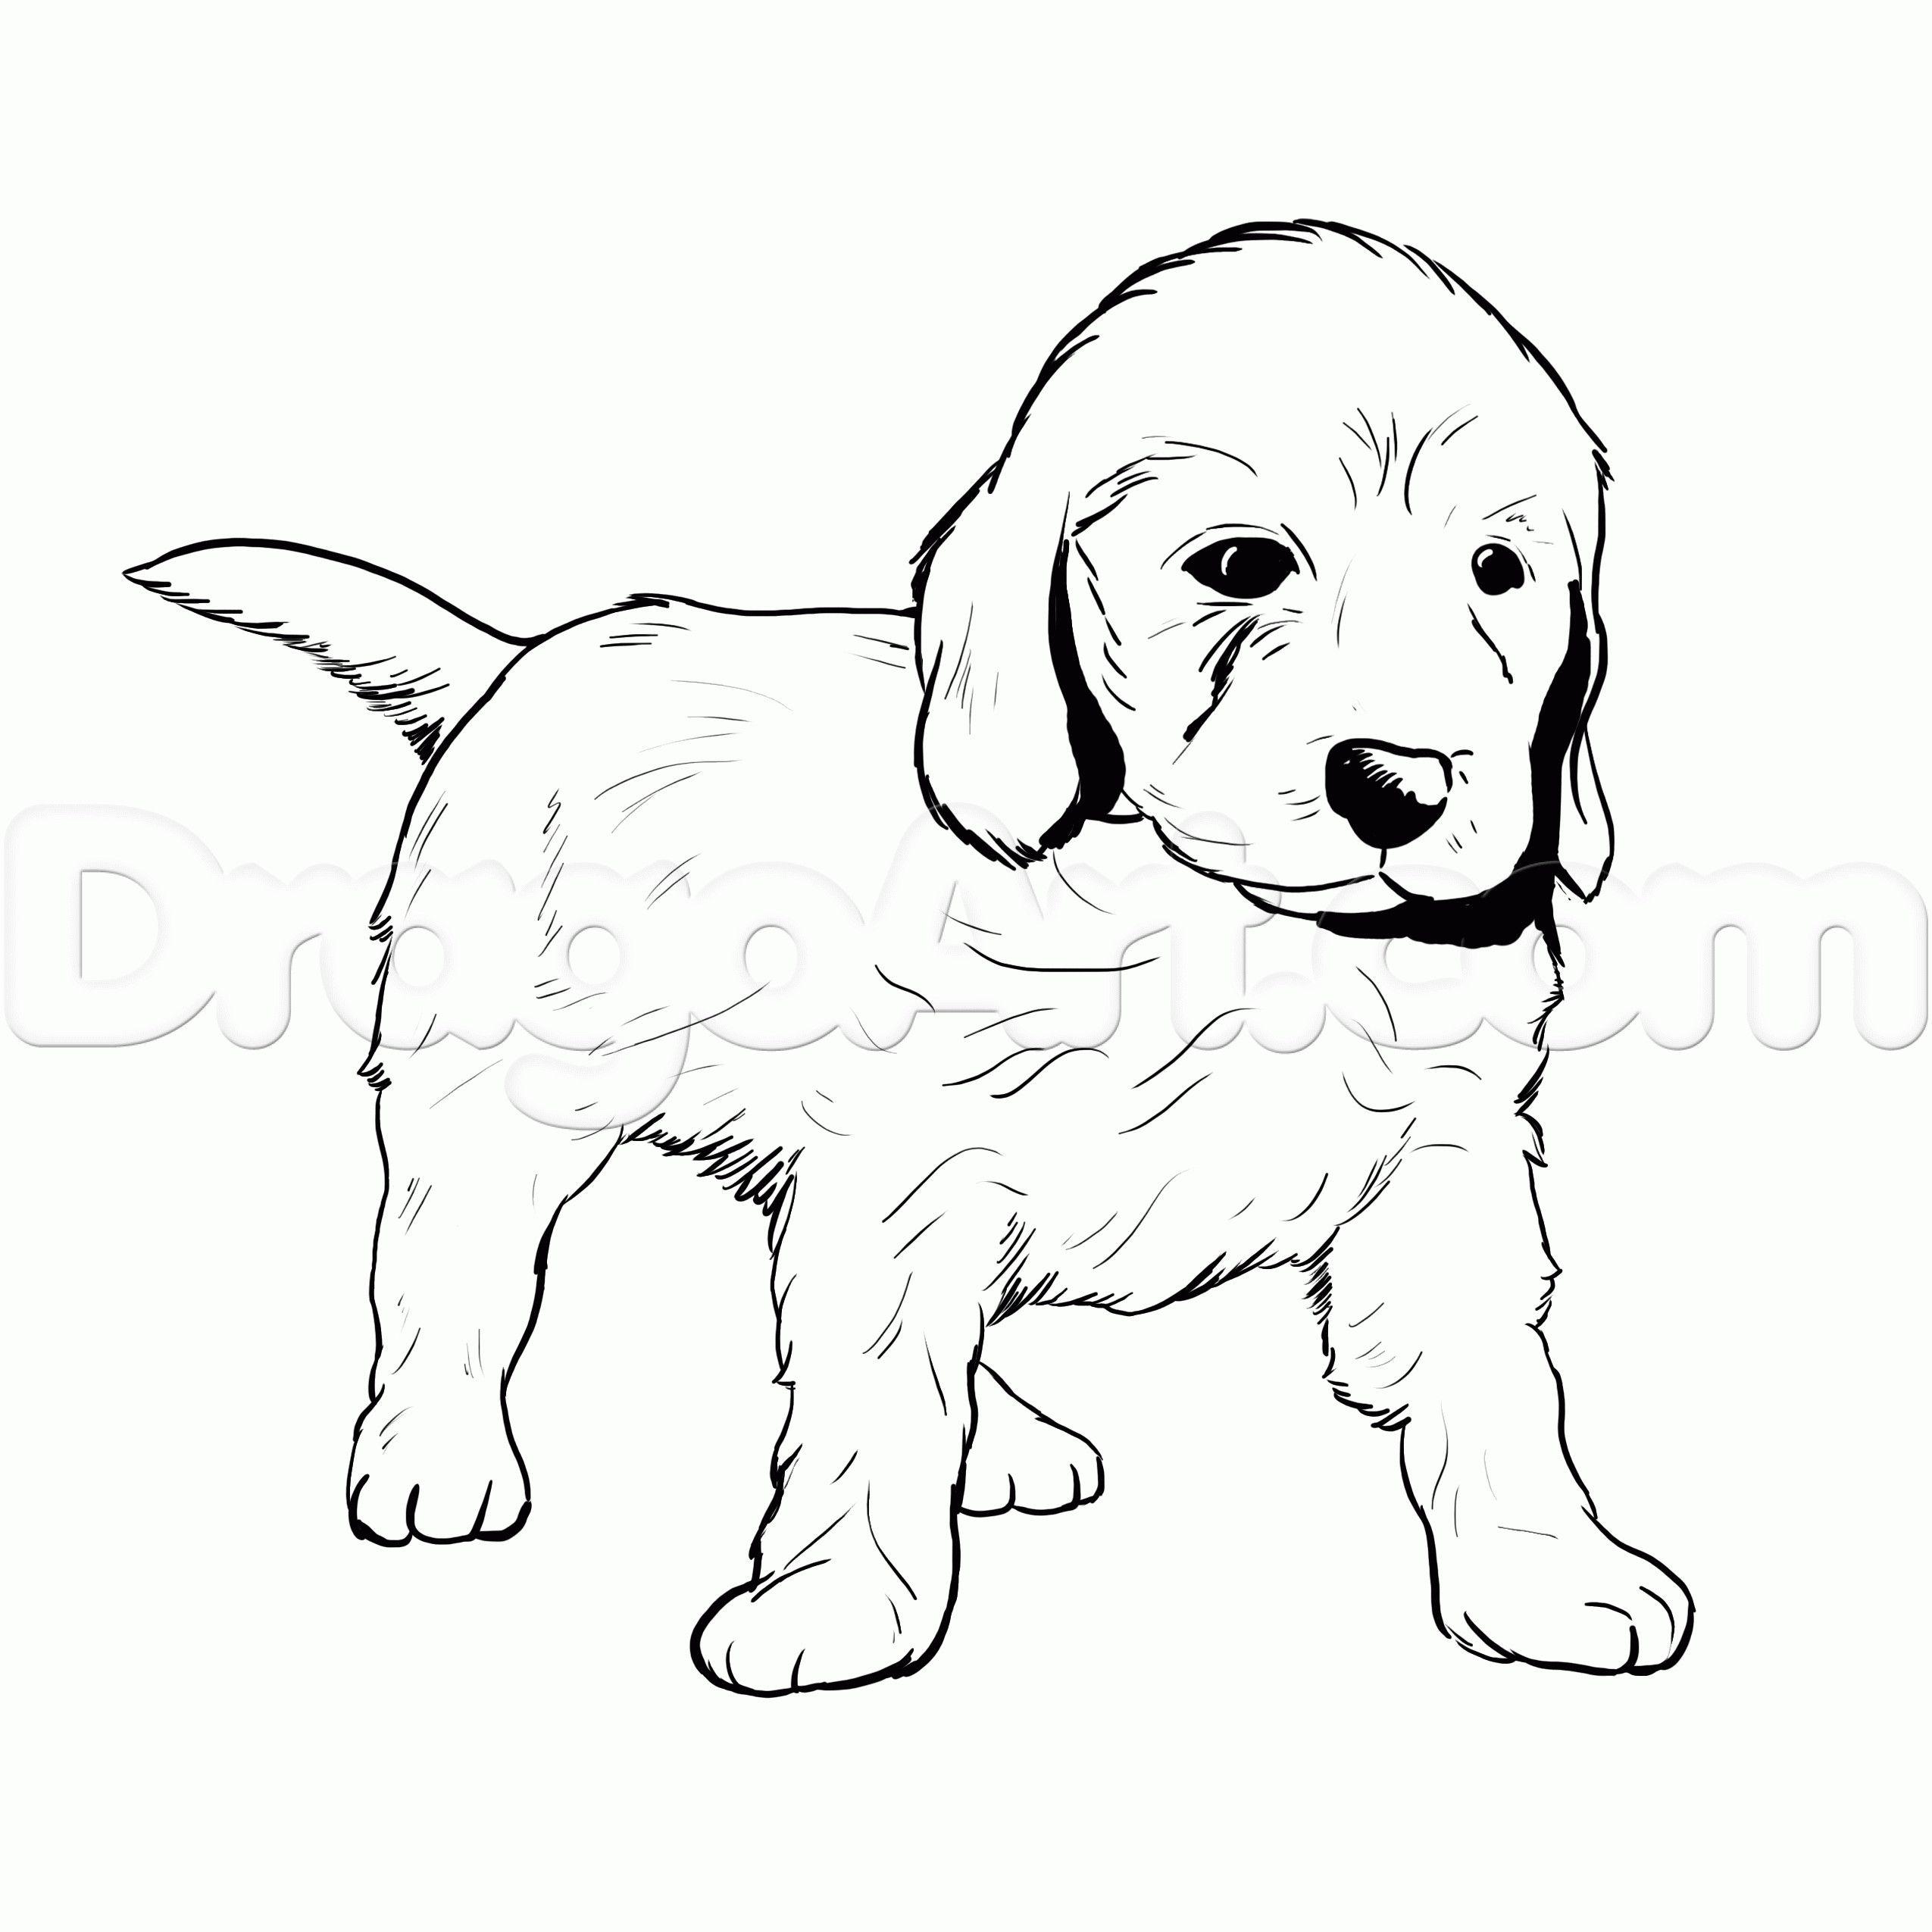 Golden Retriever Coloring Page Golden Retriever Coloring Pages New Golden Retriever Puppy Coloring Albanysinsanity Com Dog Coloring Page Golden Retriever Drawing Puppy Coloring Pages